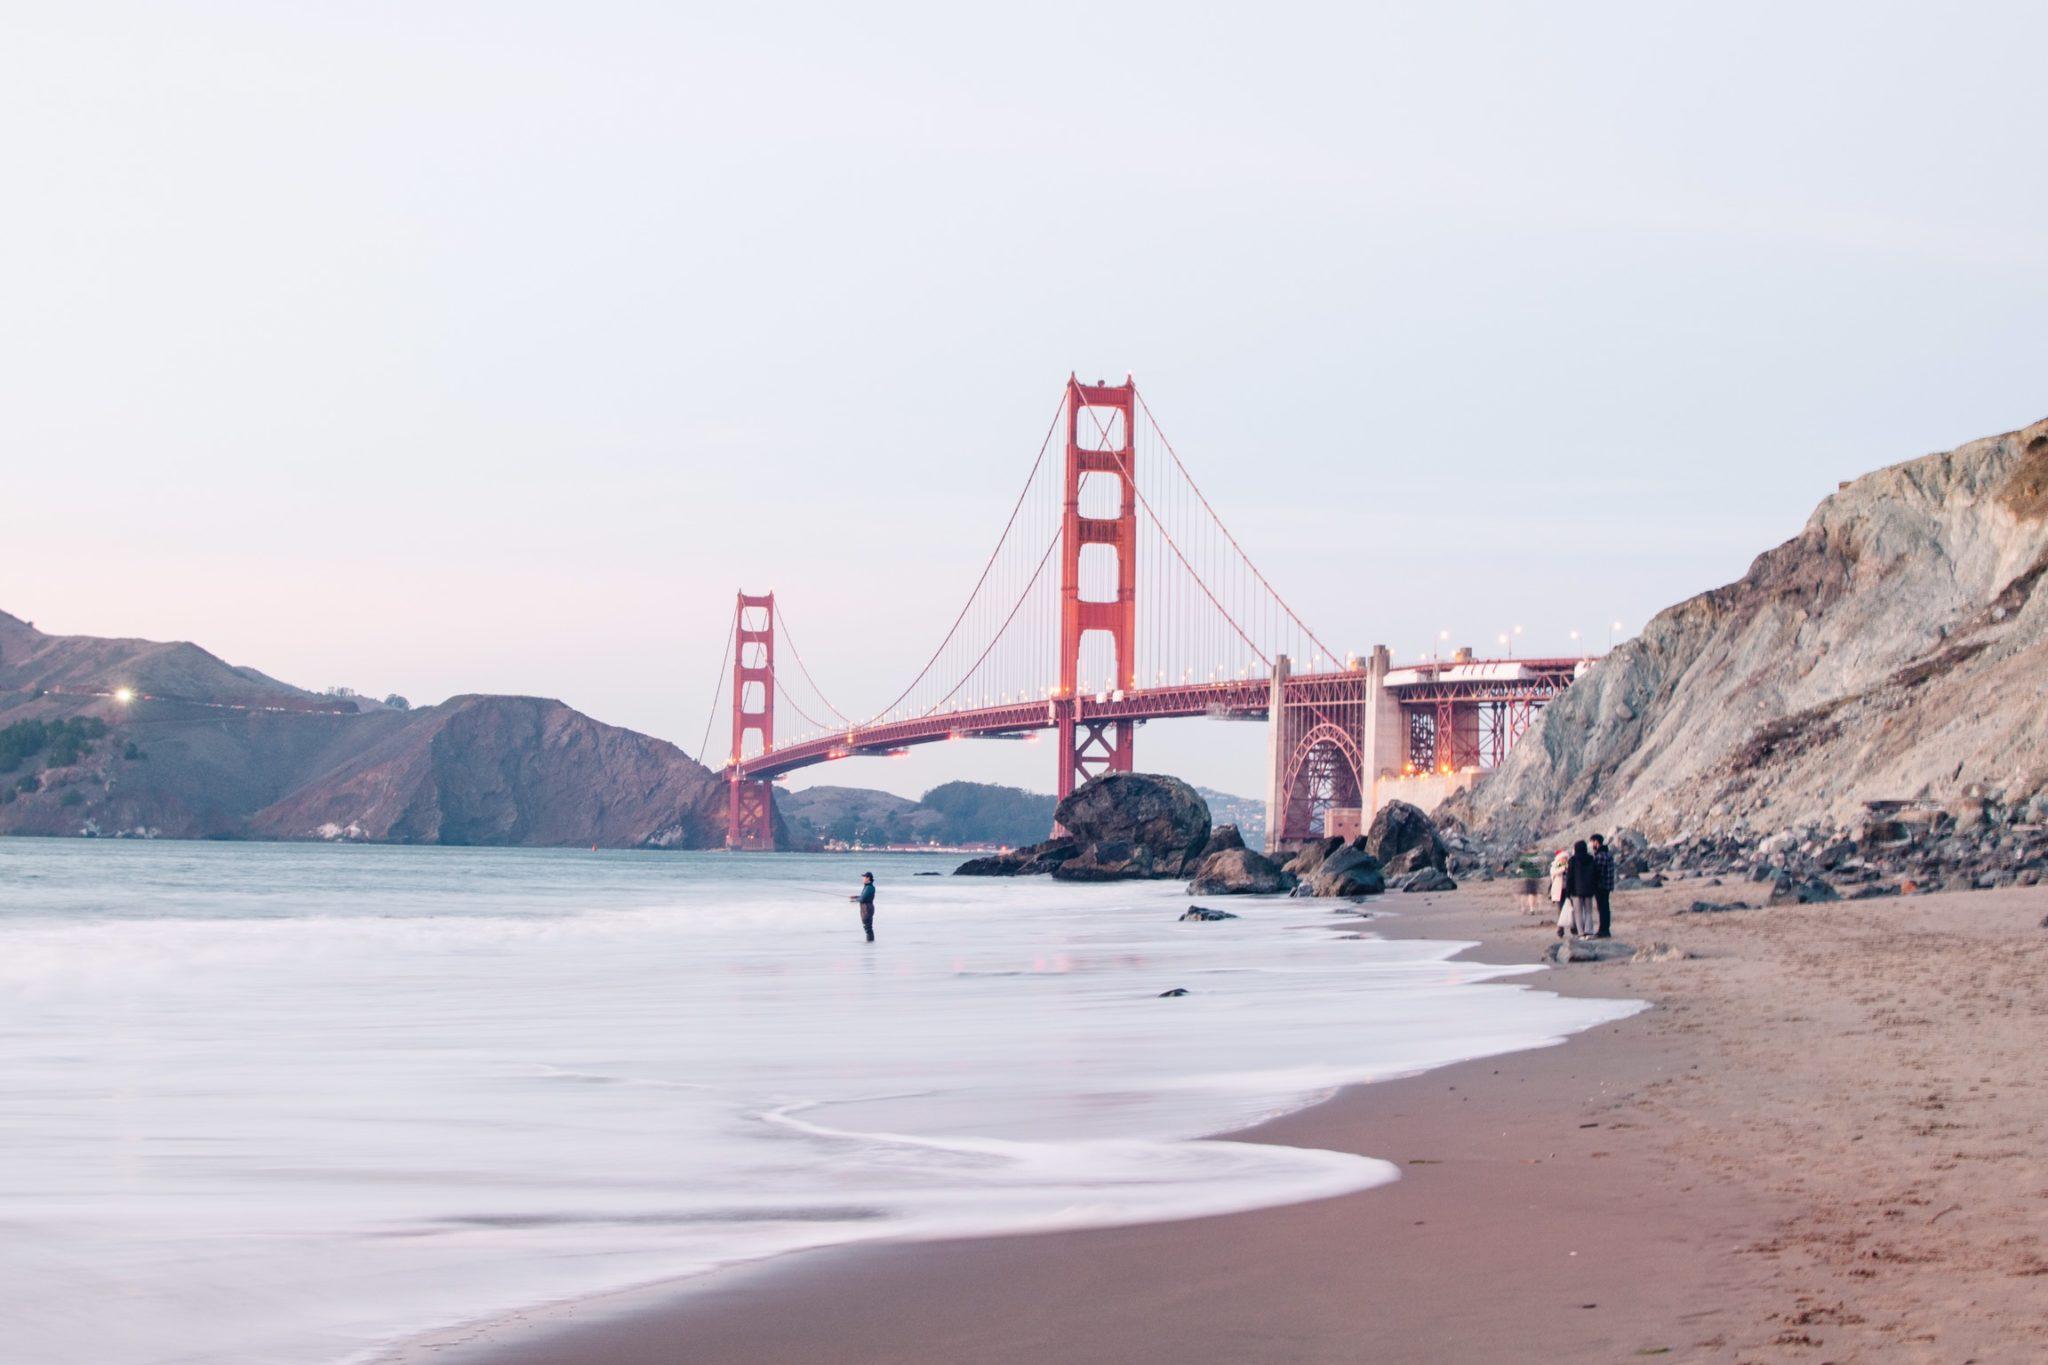 Best views of the Golden Gate Bridge San Francisco